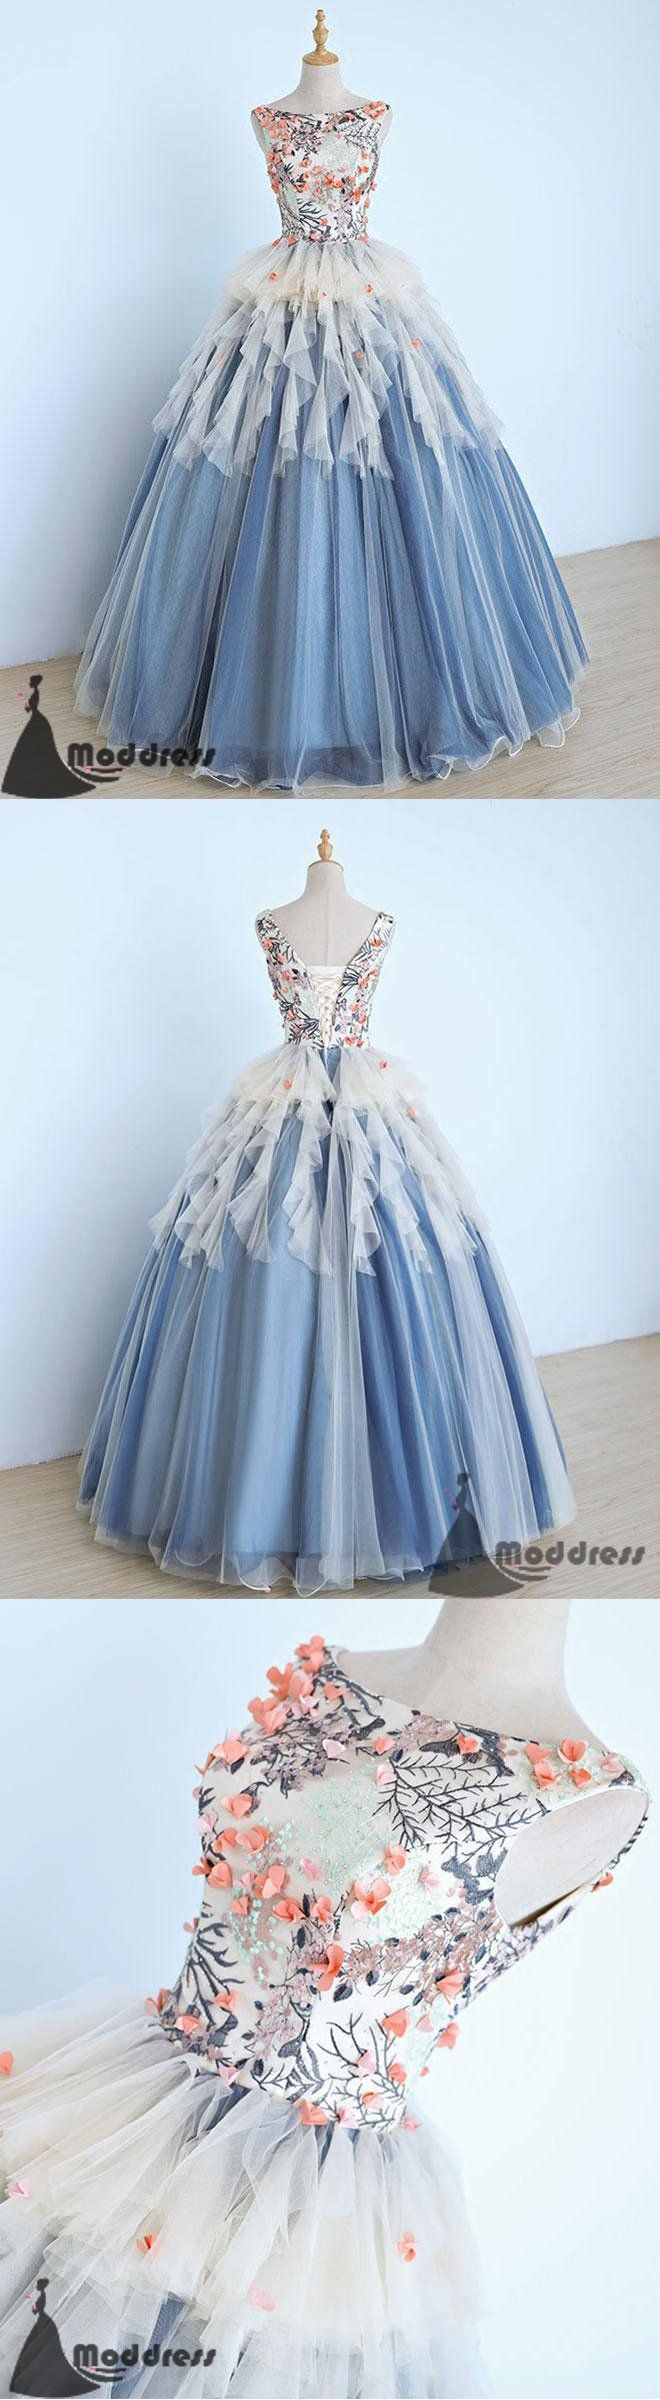 Unique long prom dress scoop evening dress applique ball gowns